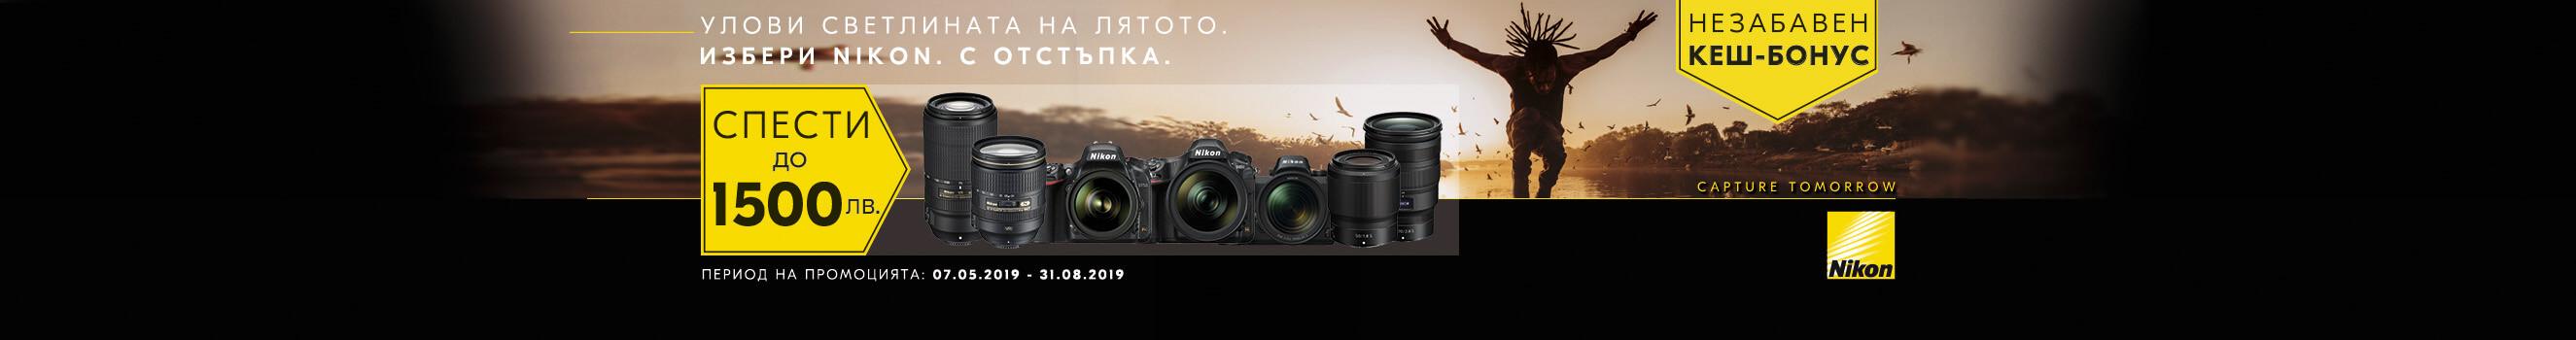 Nikon Cameras and Lenses with instant Cash Bonus